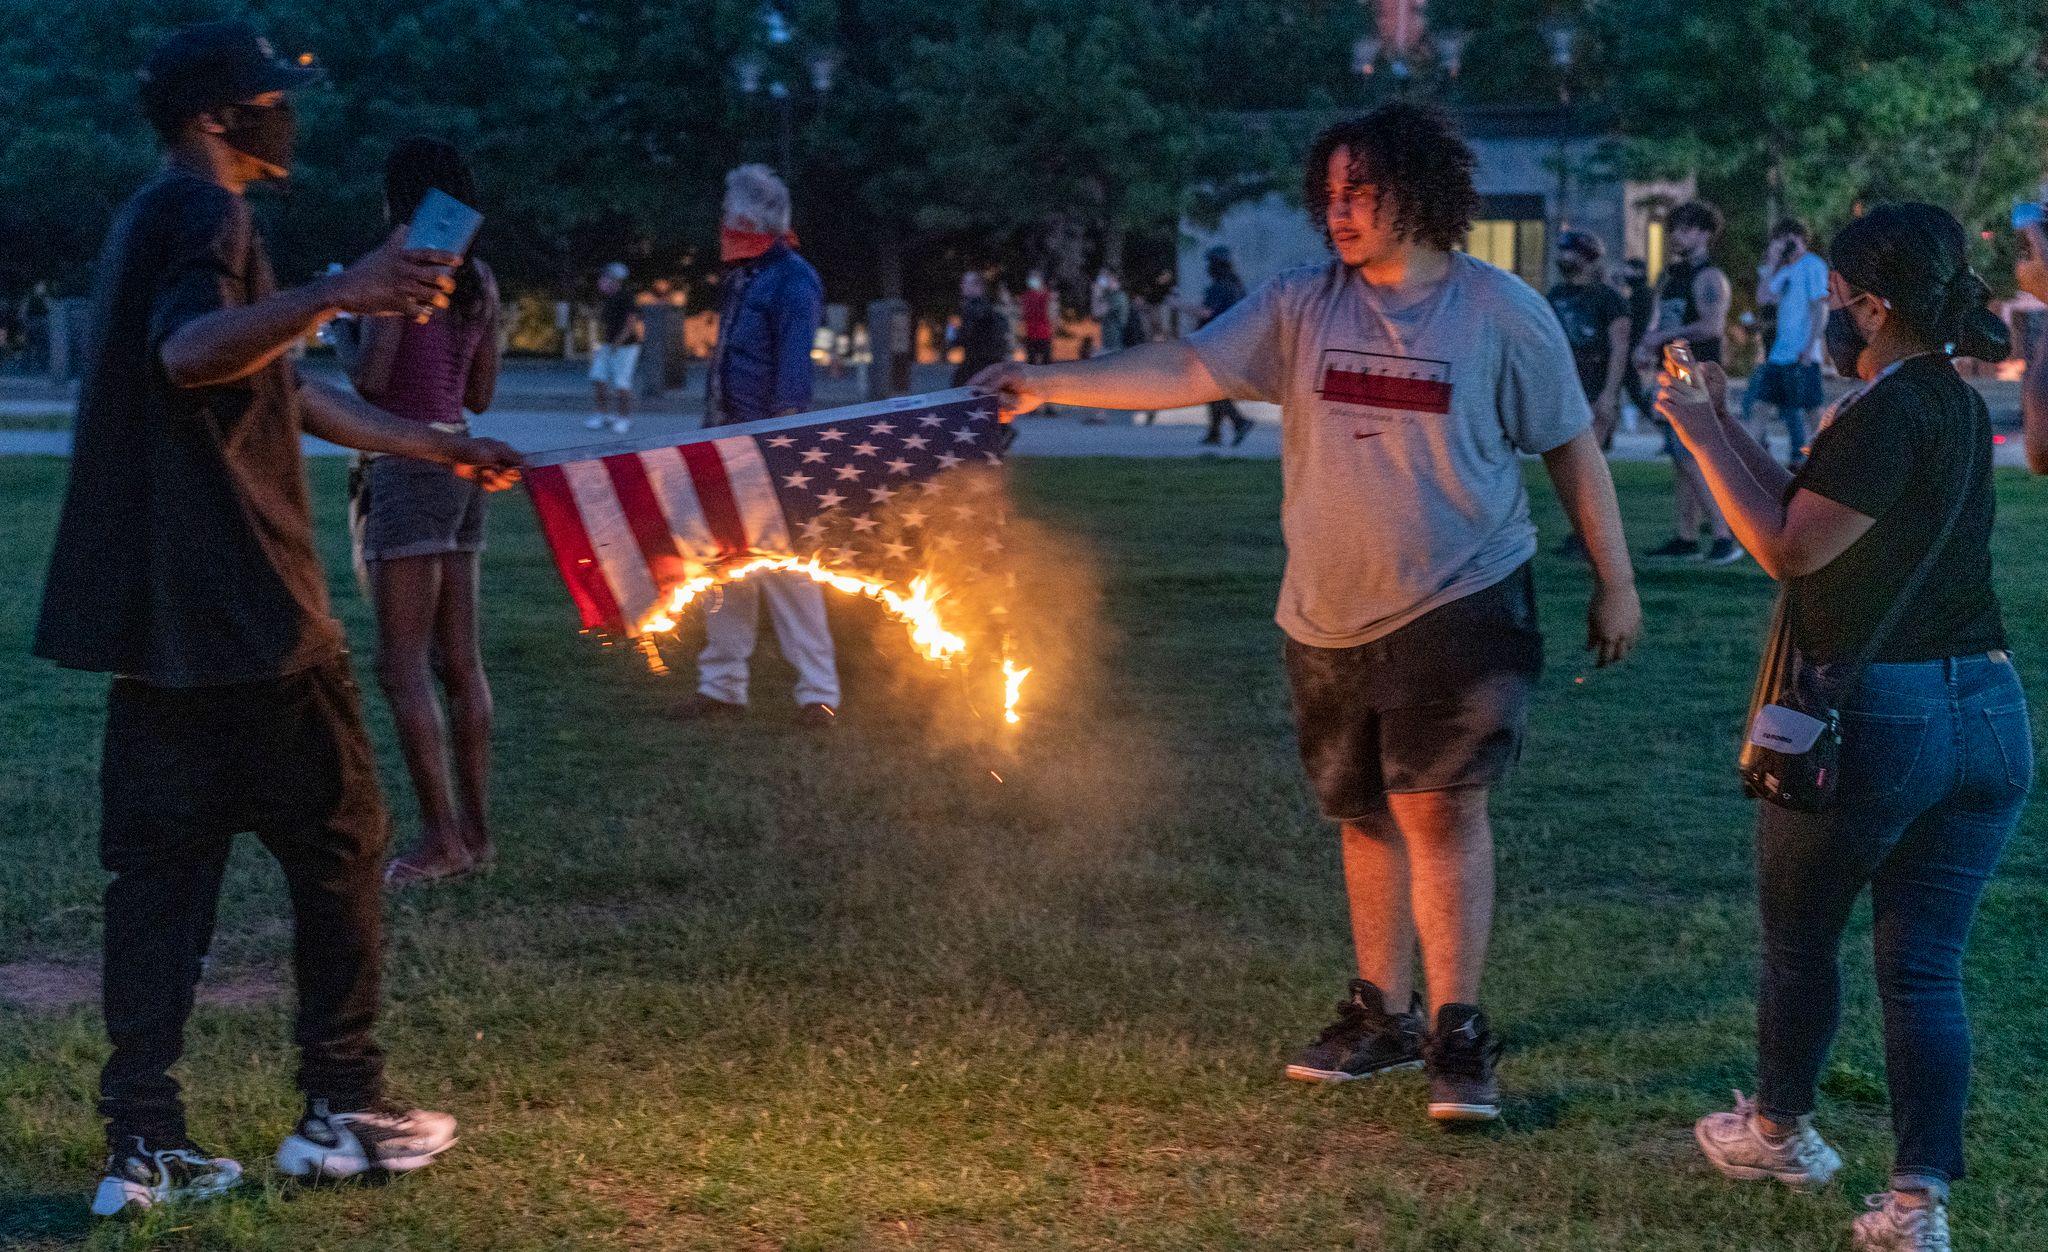 Nashville, Tenn., May 30 - The American flag on fire. (Photo: John Partipilo)